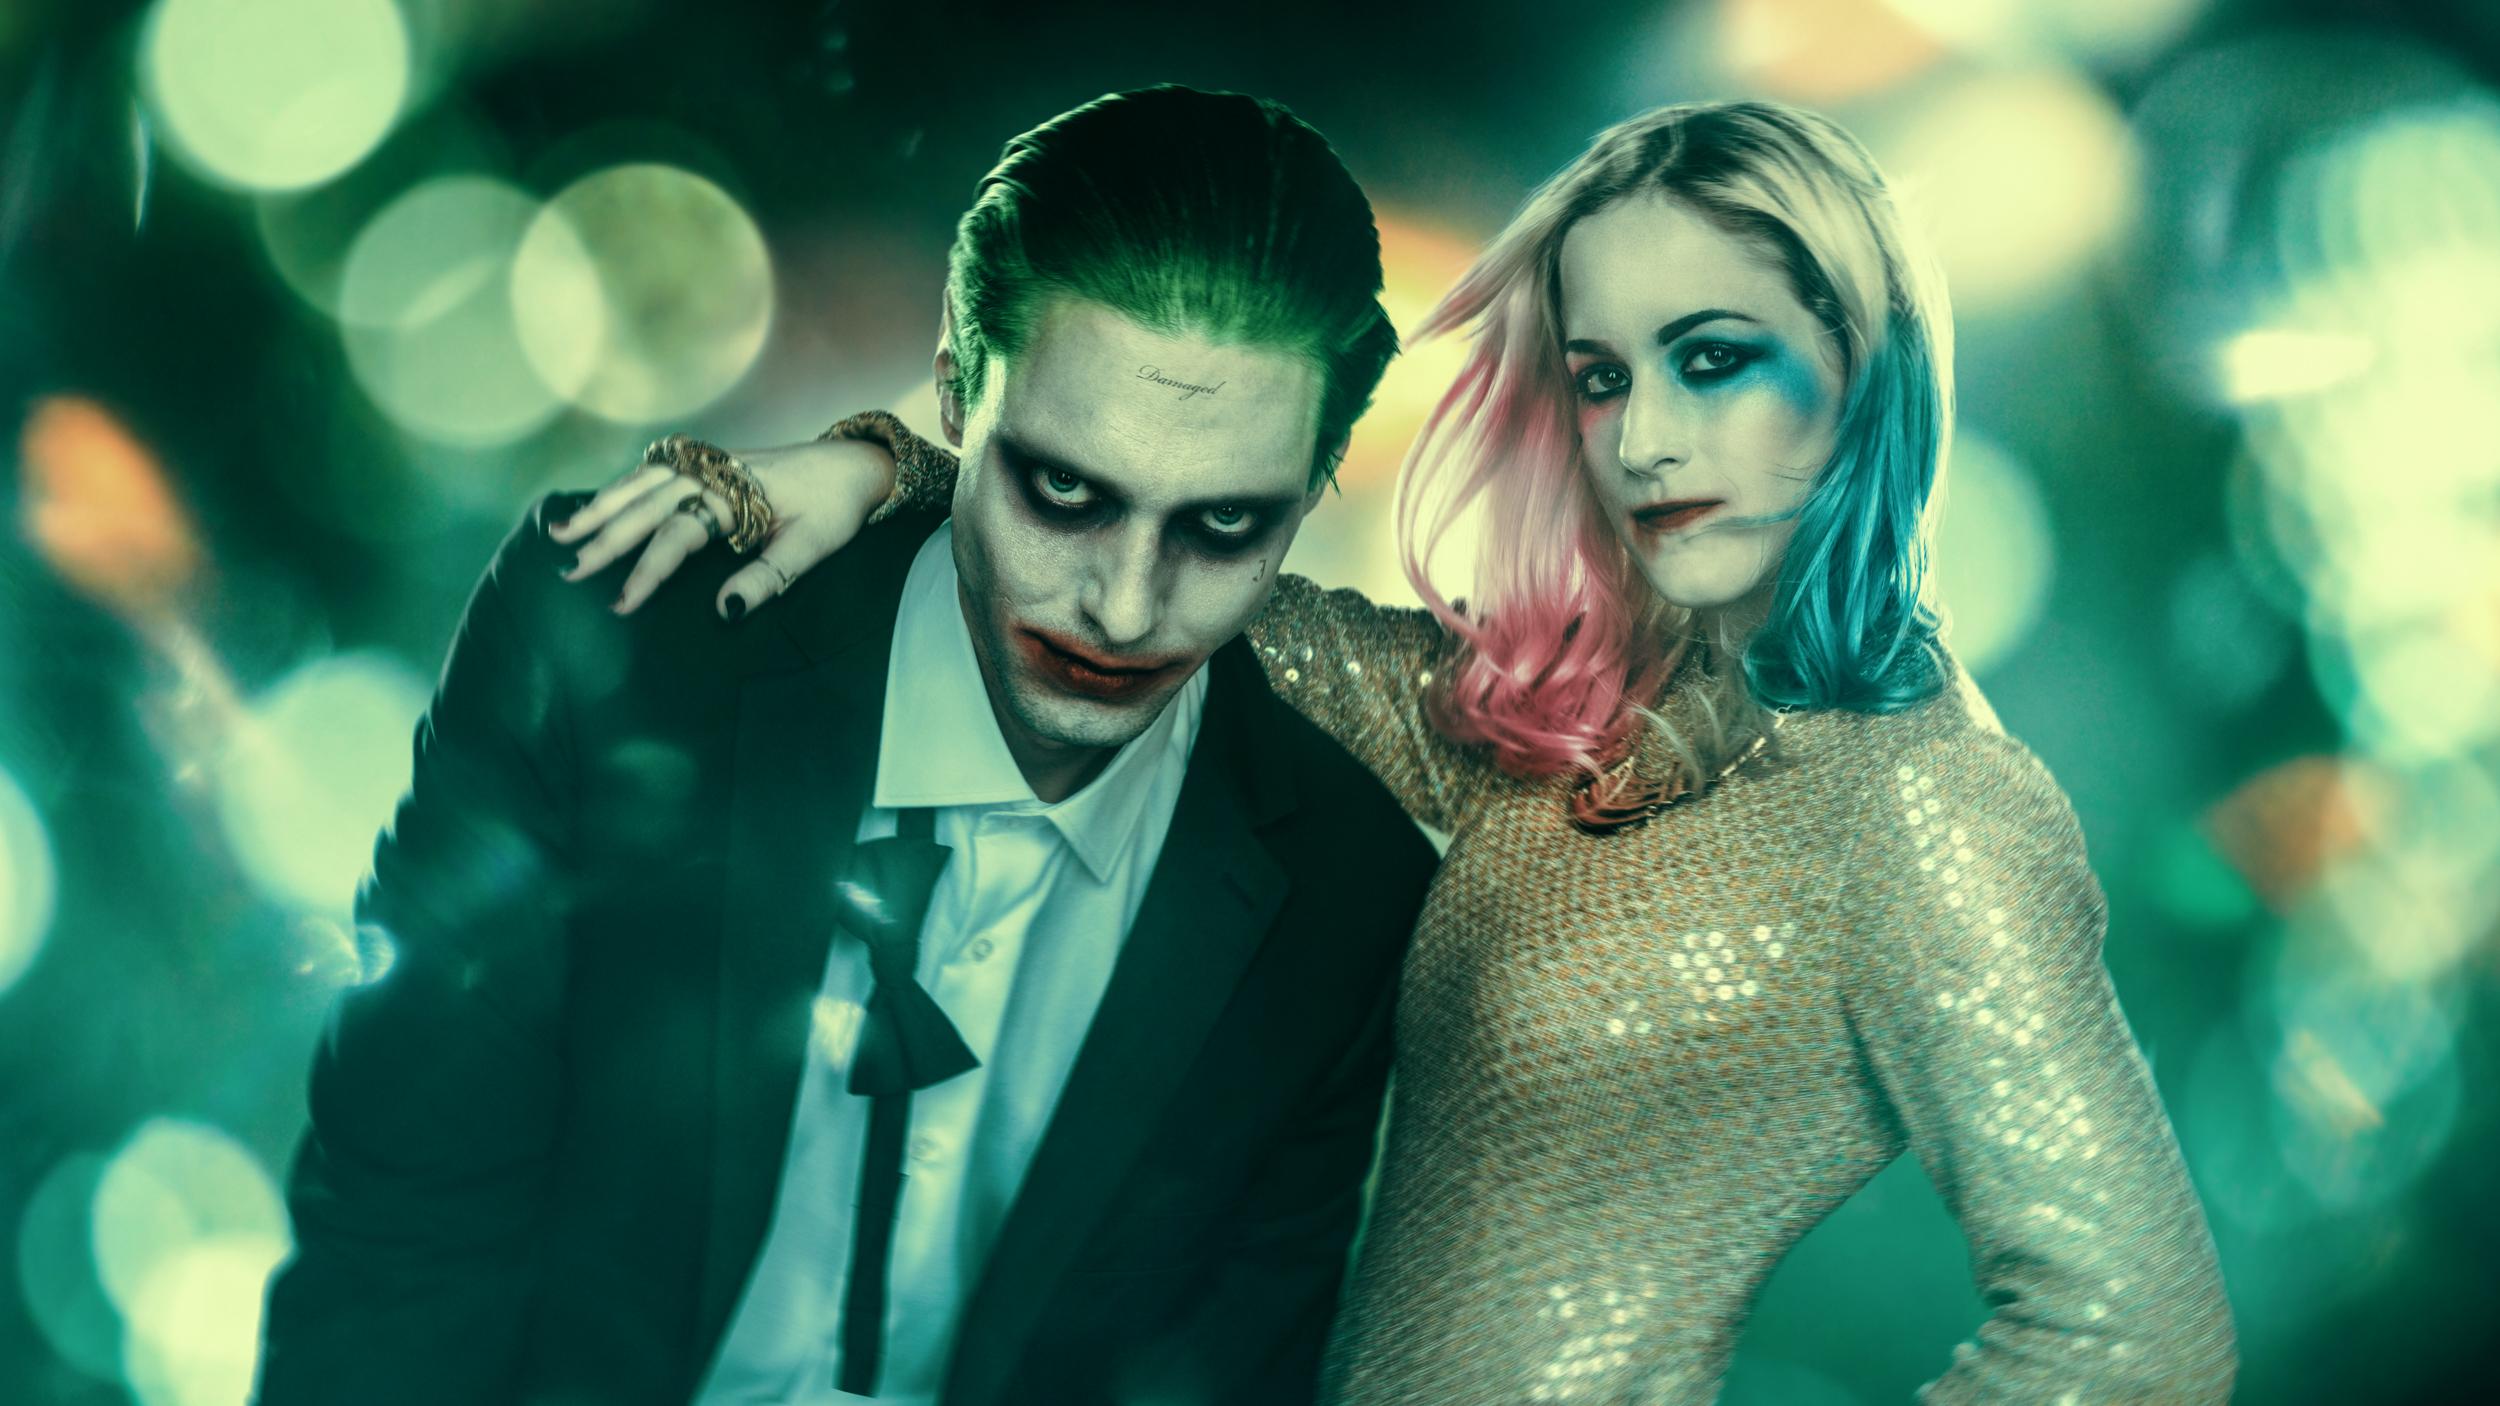 Harley&Joker_001b_R2A3721.jpg